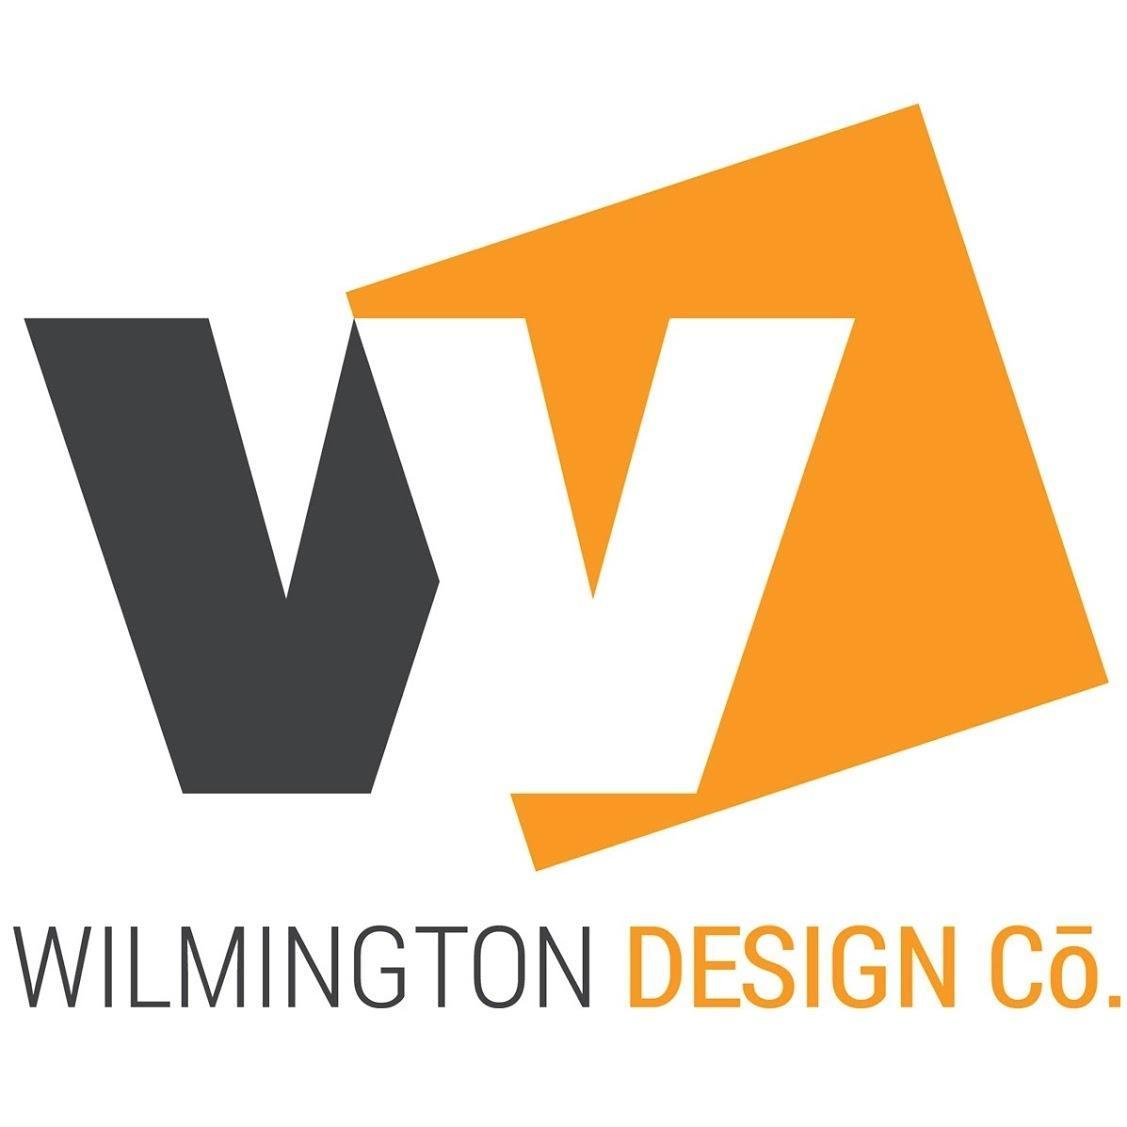 Wilmington Design Company